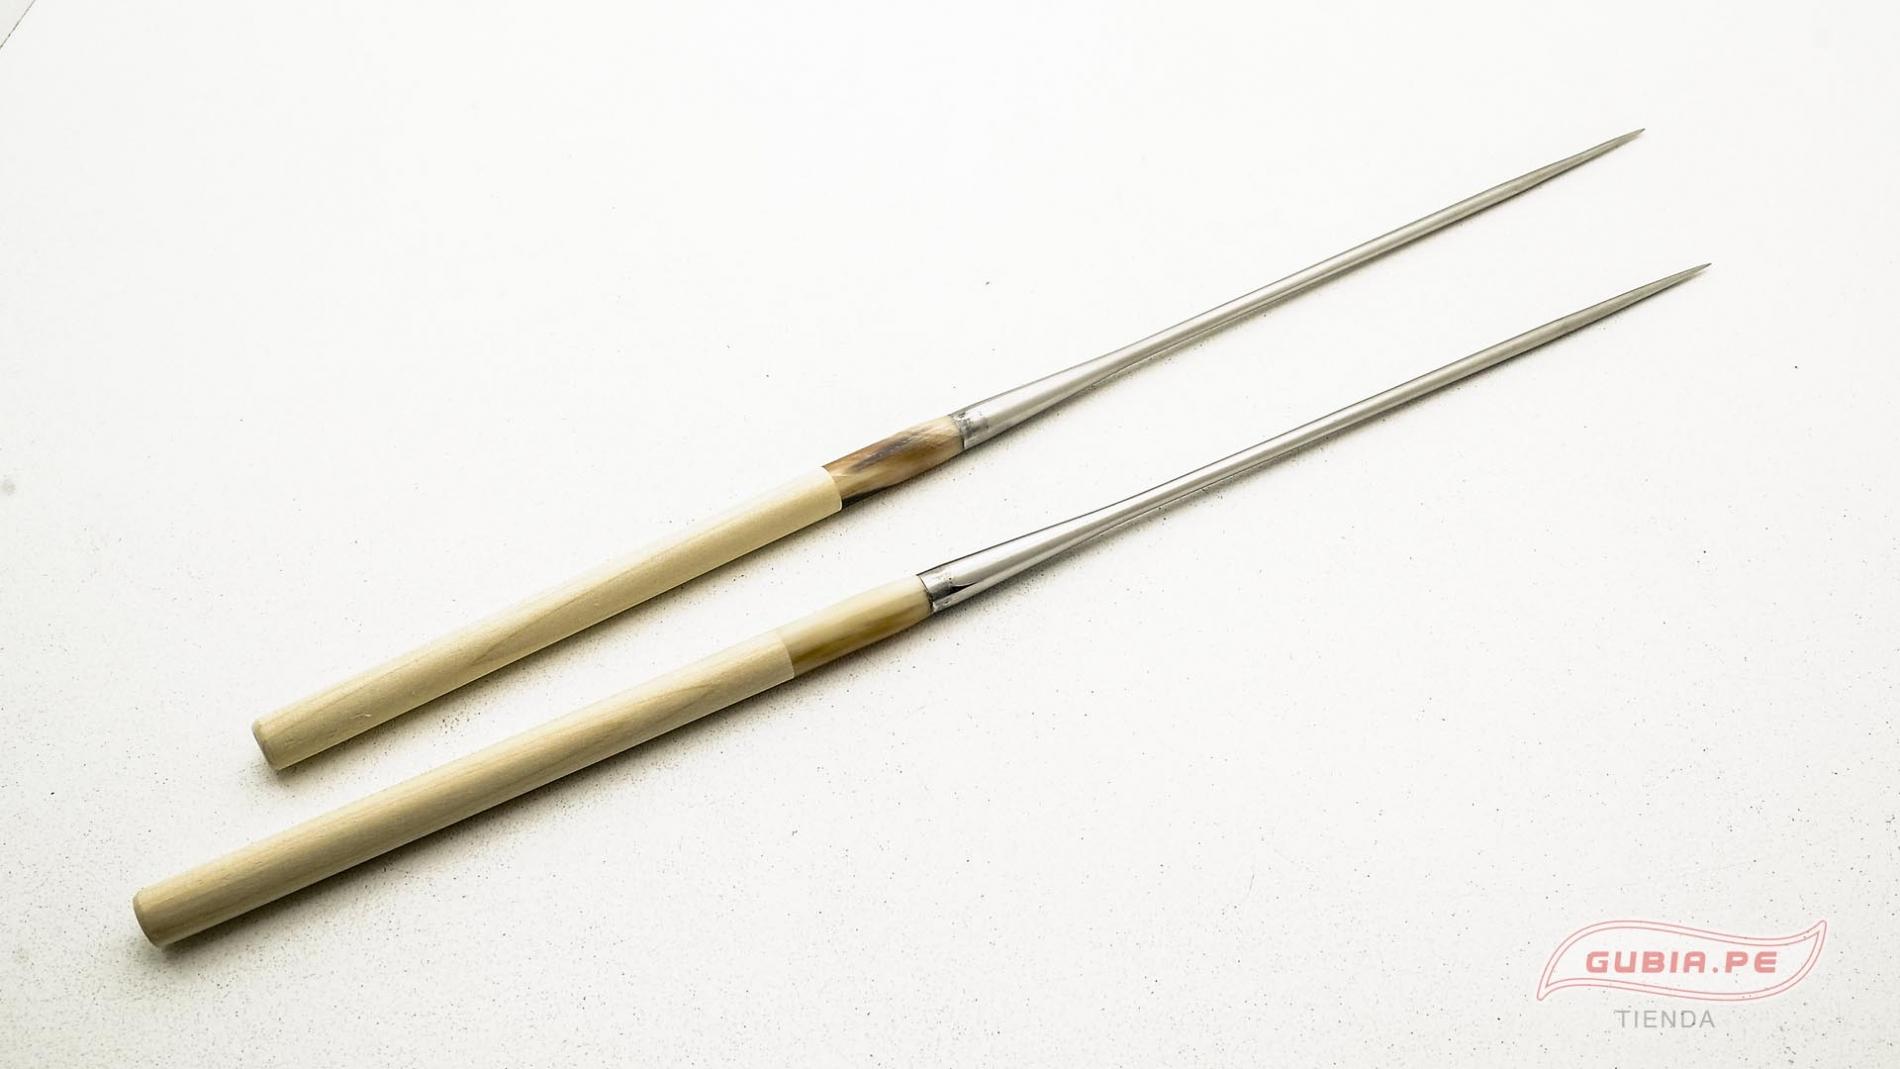 GUB0037-Palitos servir sushi Moribashi Chopsticks metal 21cm GUB0037-max-1.